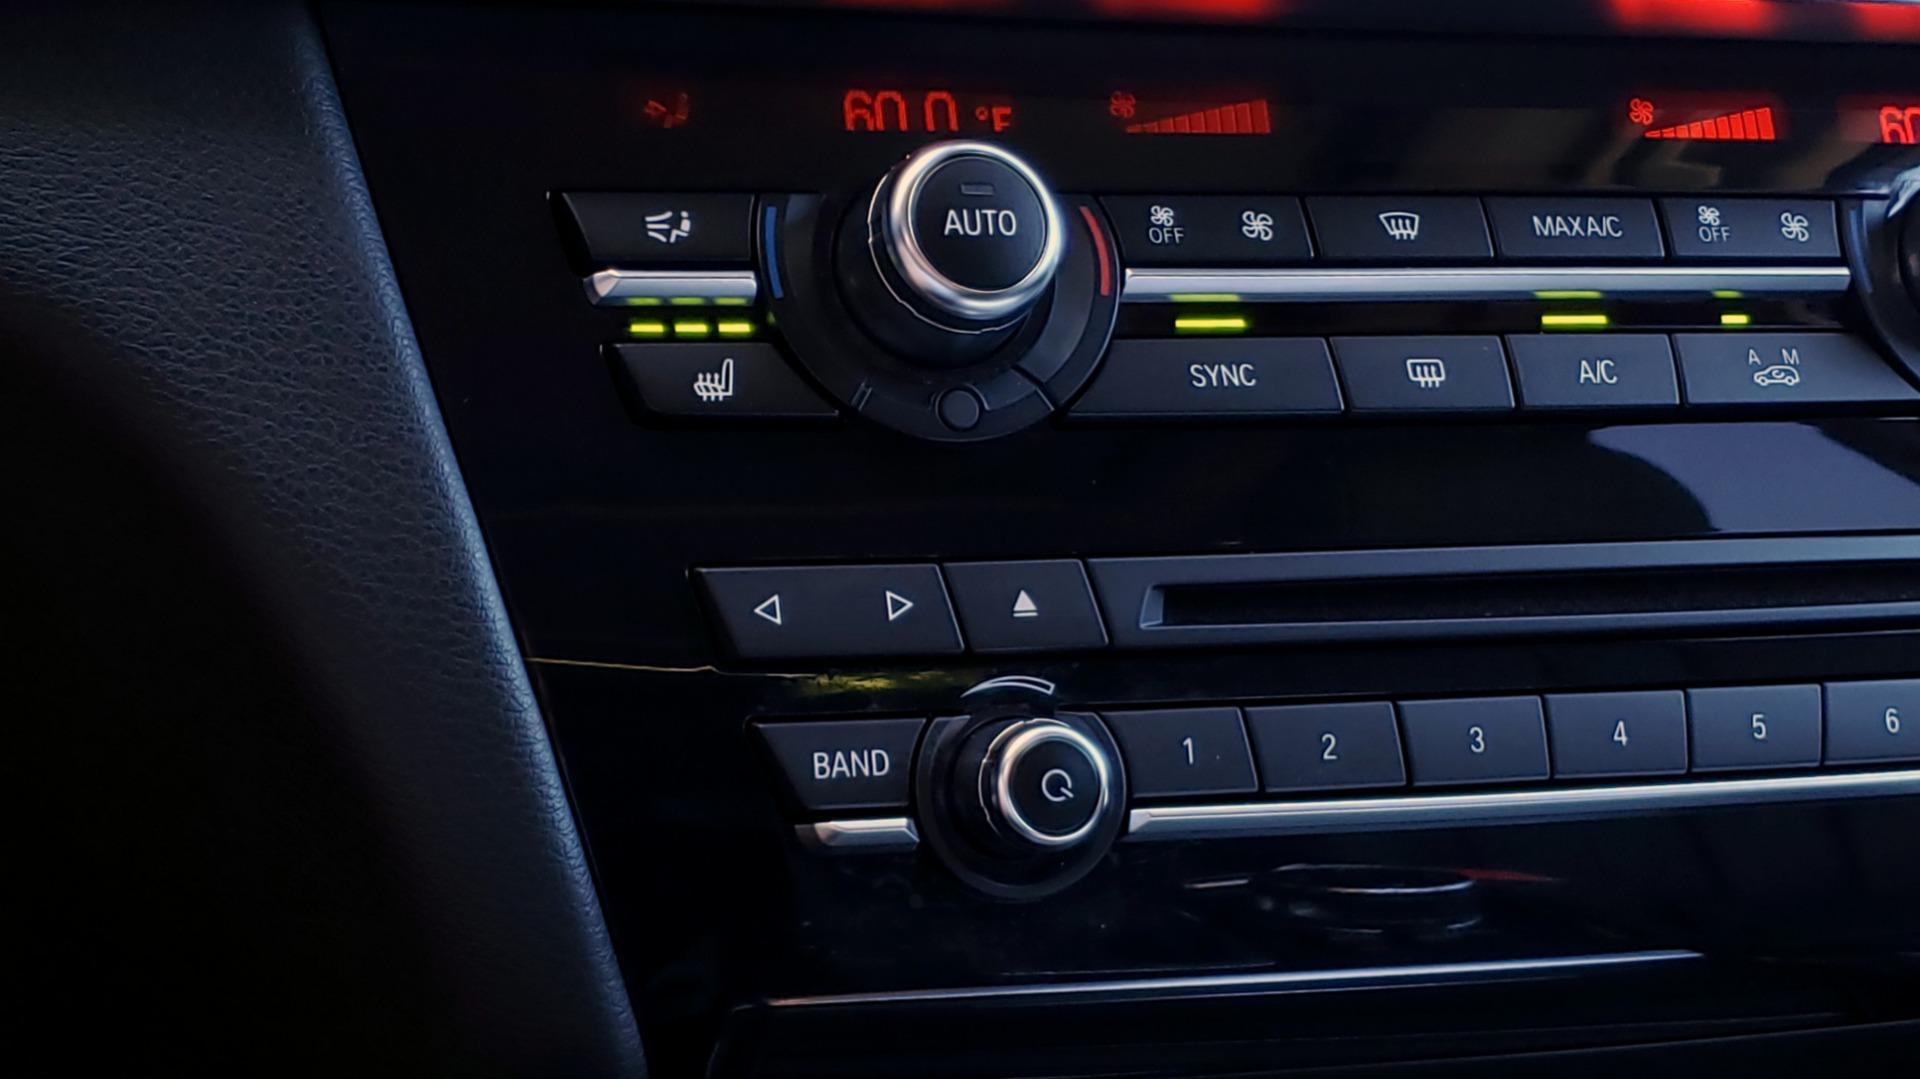 Used 2016 BMW X5 XDRIVE35I / PREM PKG / NAV / DRVR ASST PLUS / REARVIEW for sale $25,765 at Formula Imports in Charlotte NC 28227 35